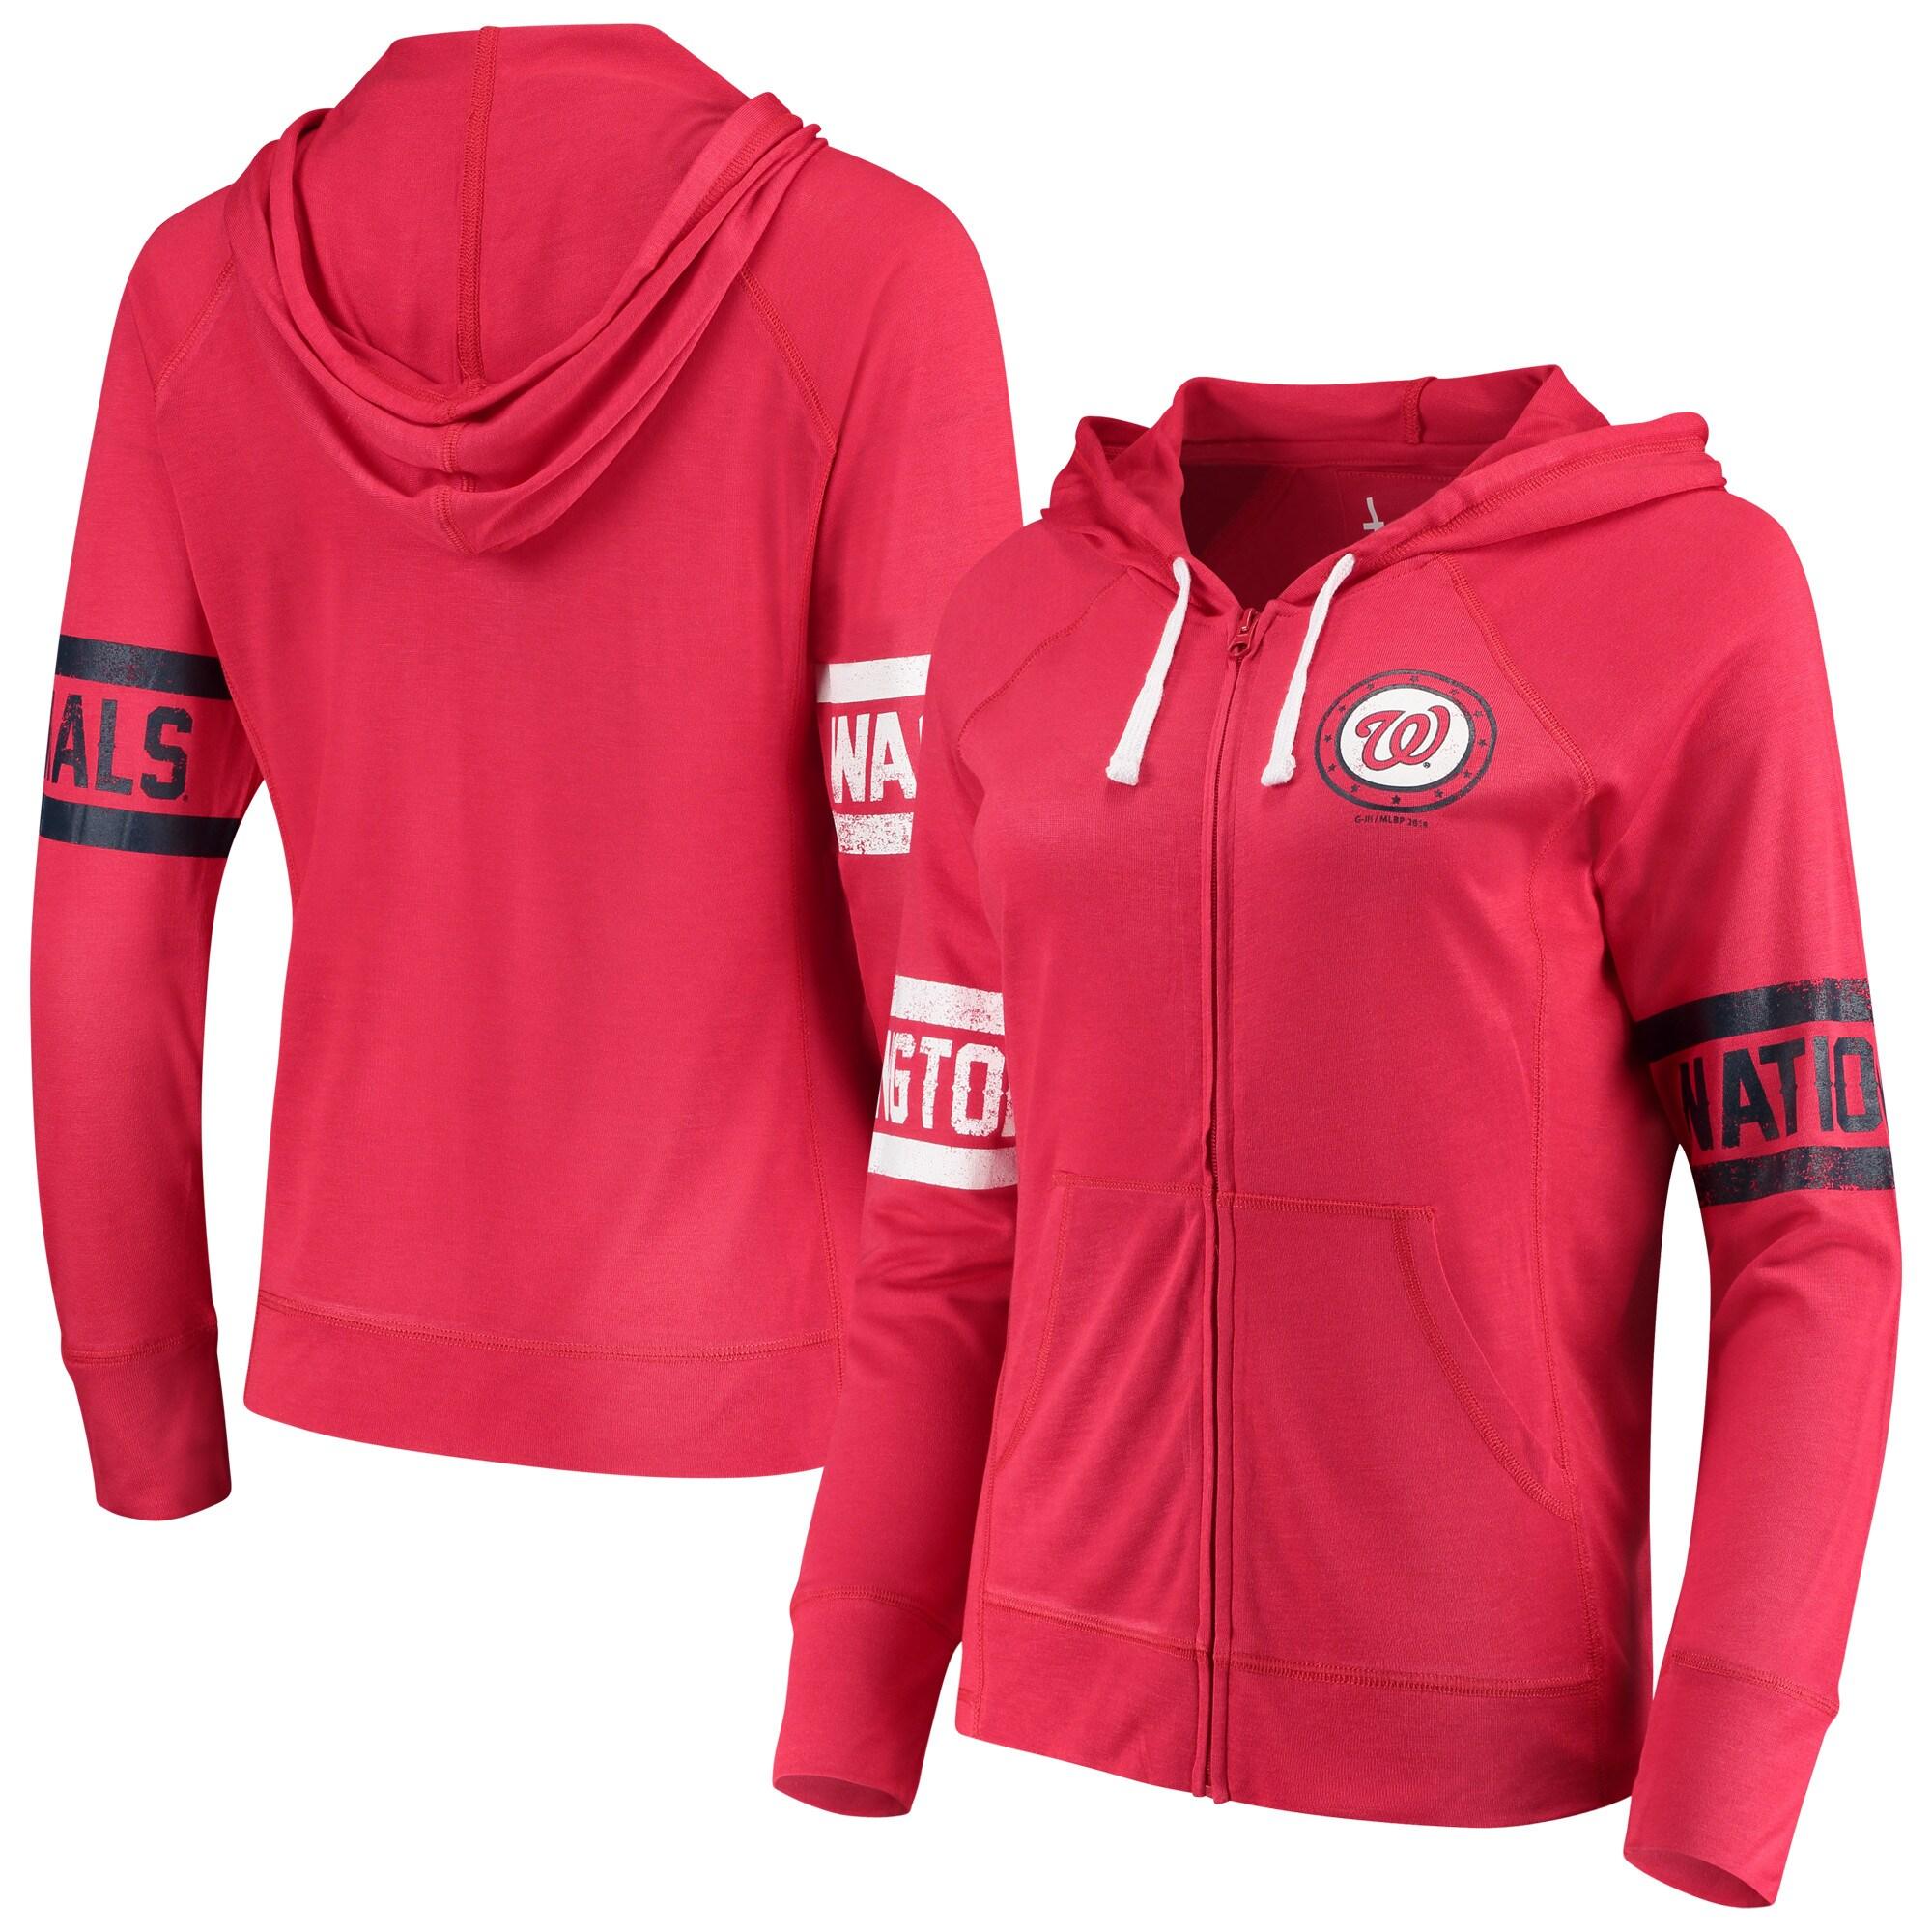 Washington Nationals Touch by Alyssa Milano Women's Postseason Hoodie - Red